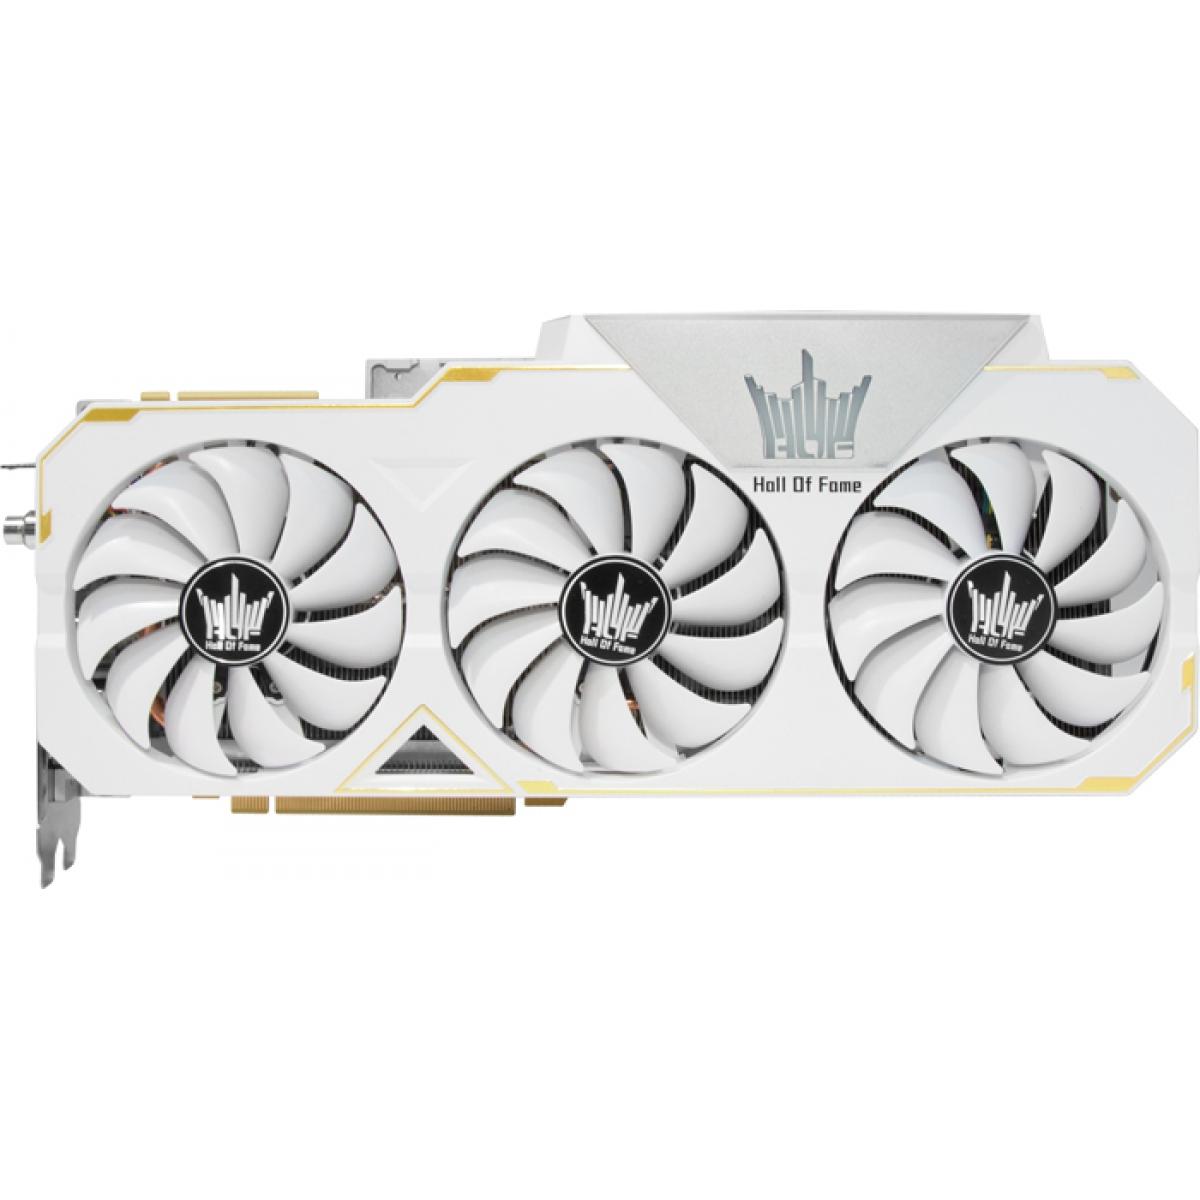 Placa de Vídeo Galax Geforce RTX 2080 Ti HOF, 11GB GDDR6, 352Bit, 28IULBUCV6DH